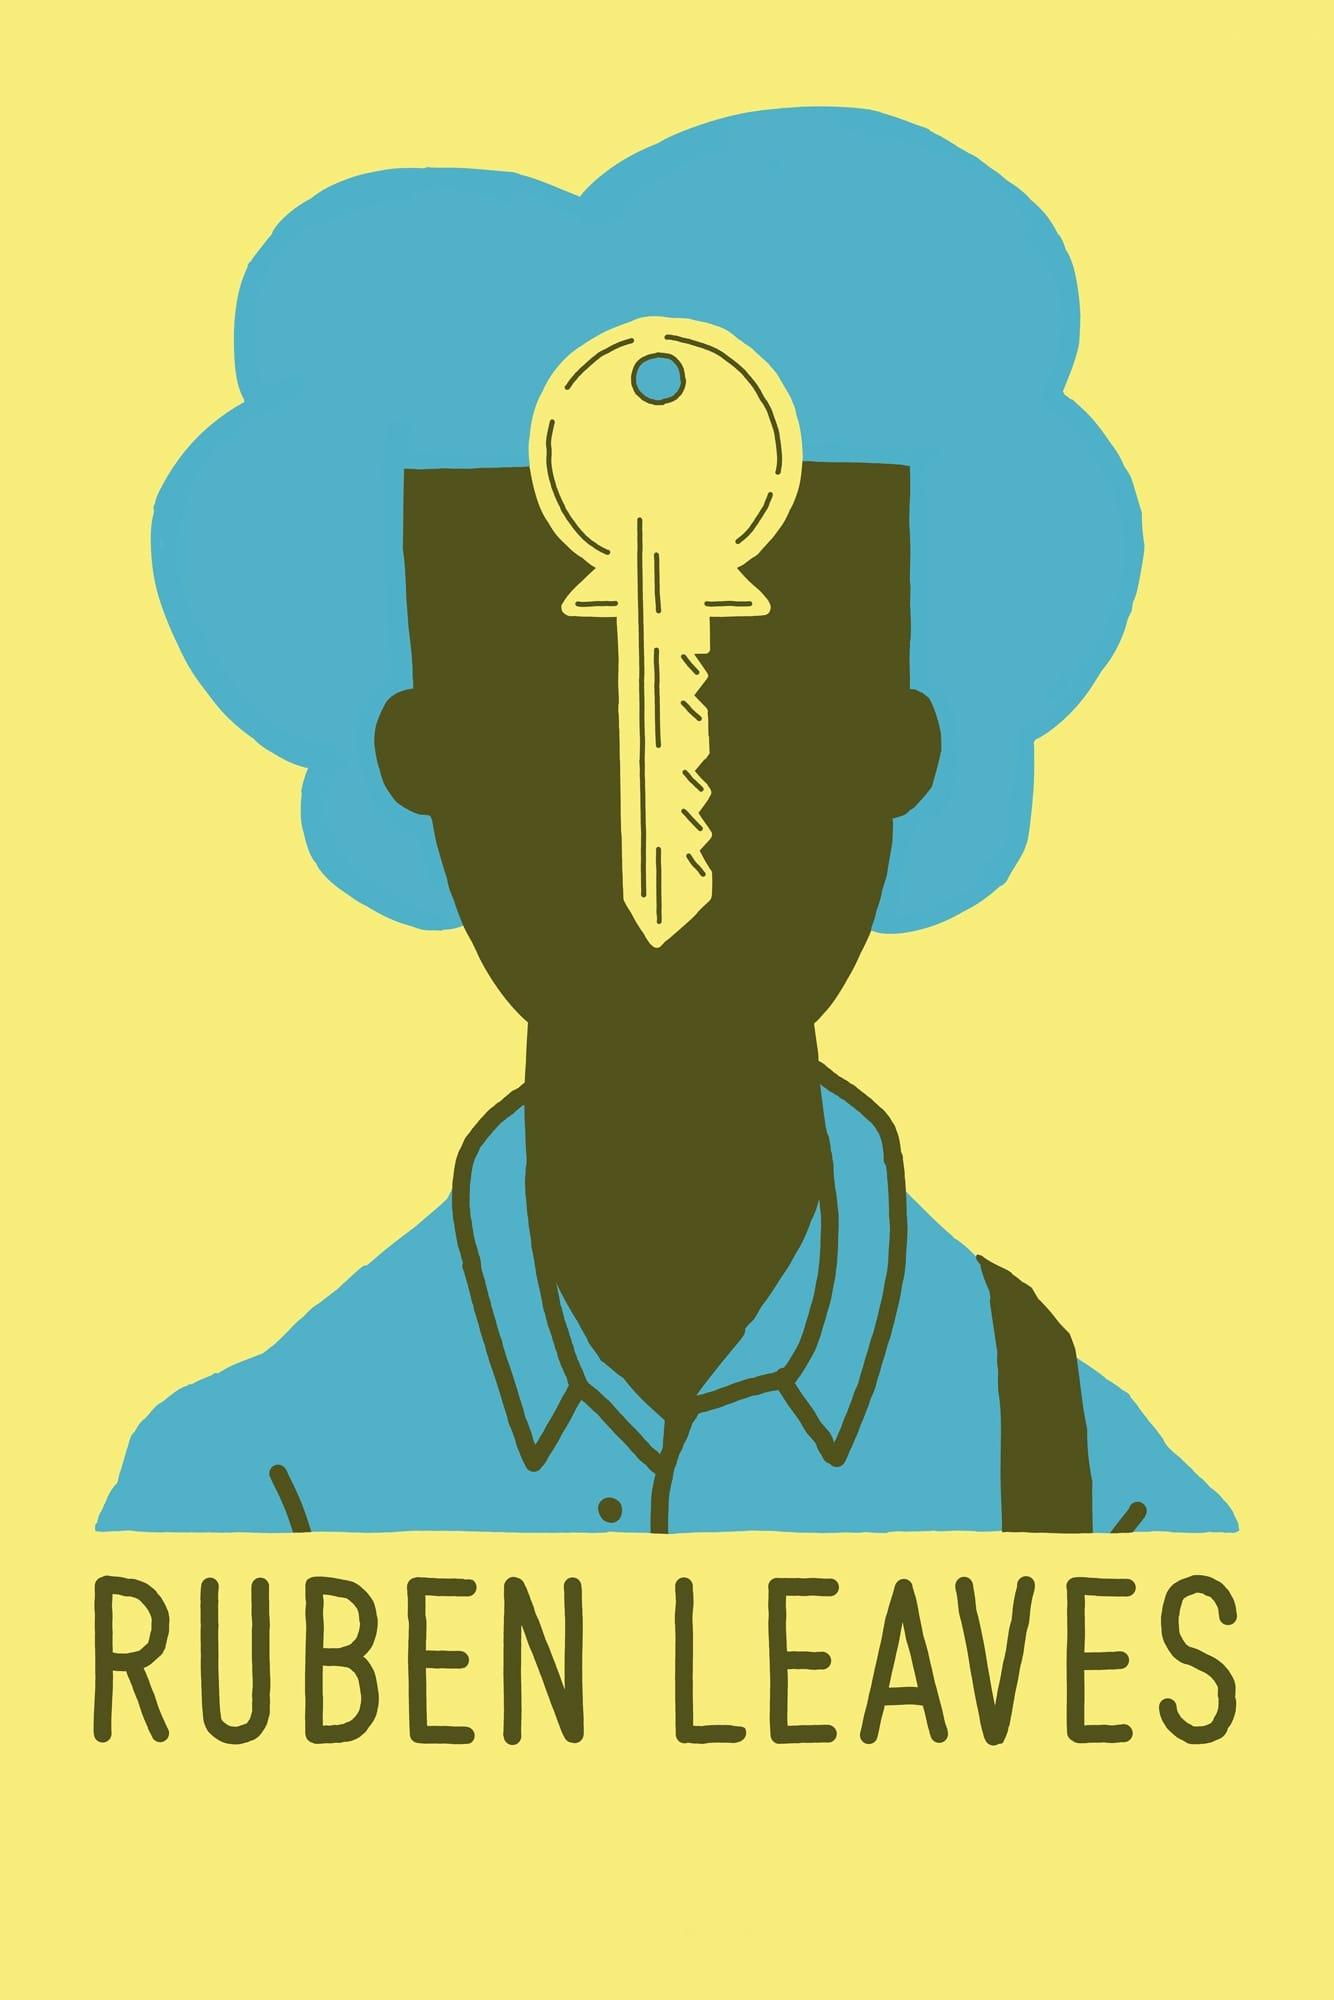 Ruben Leaves